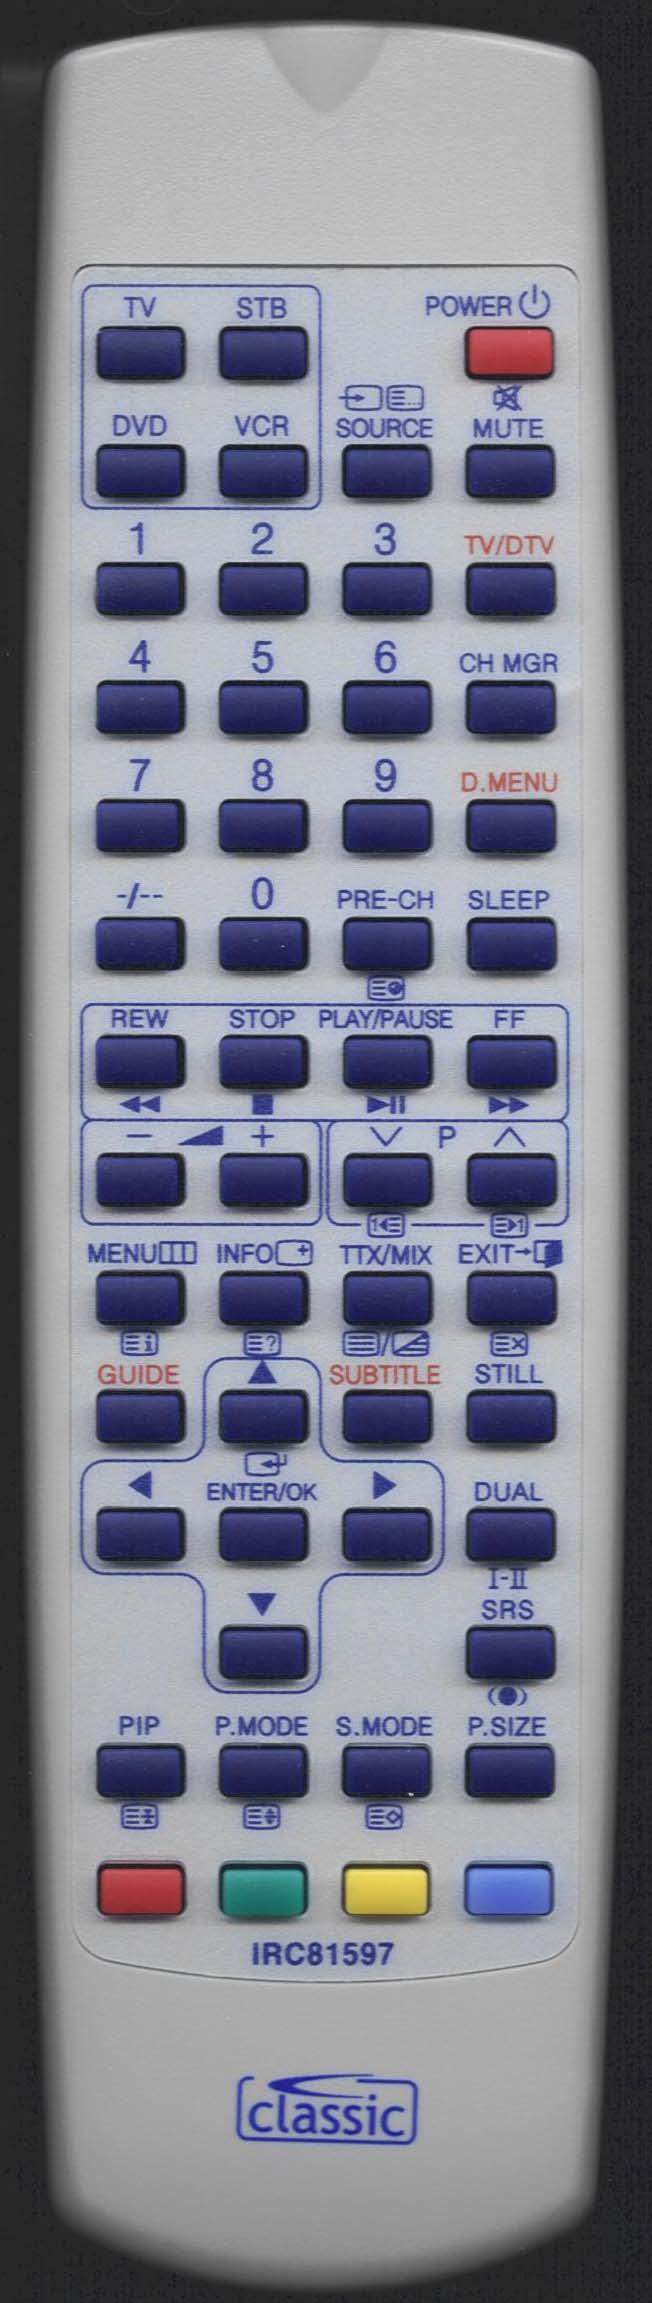 SAMSUNG LE26R74BD Remote Control Alternative